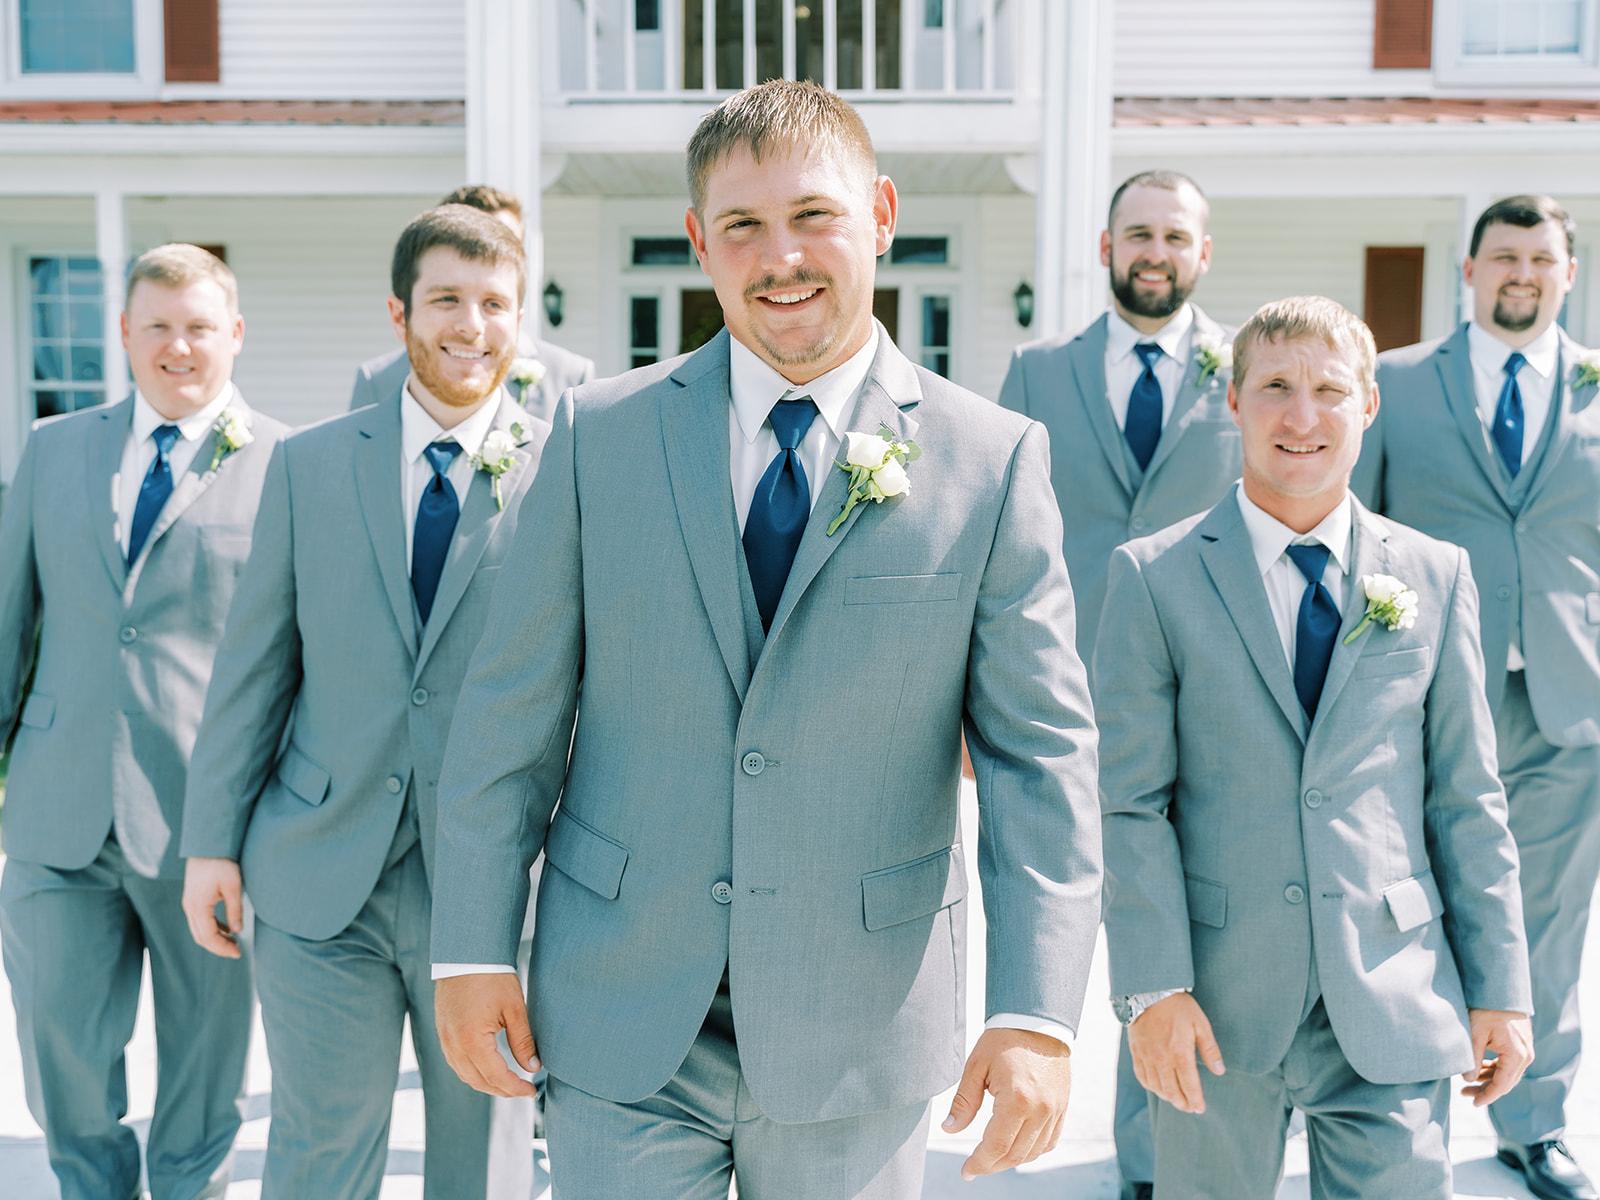 Gray and blue groomsmen tuxedos | Nashville Bride Guide